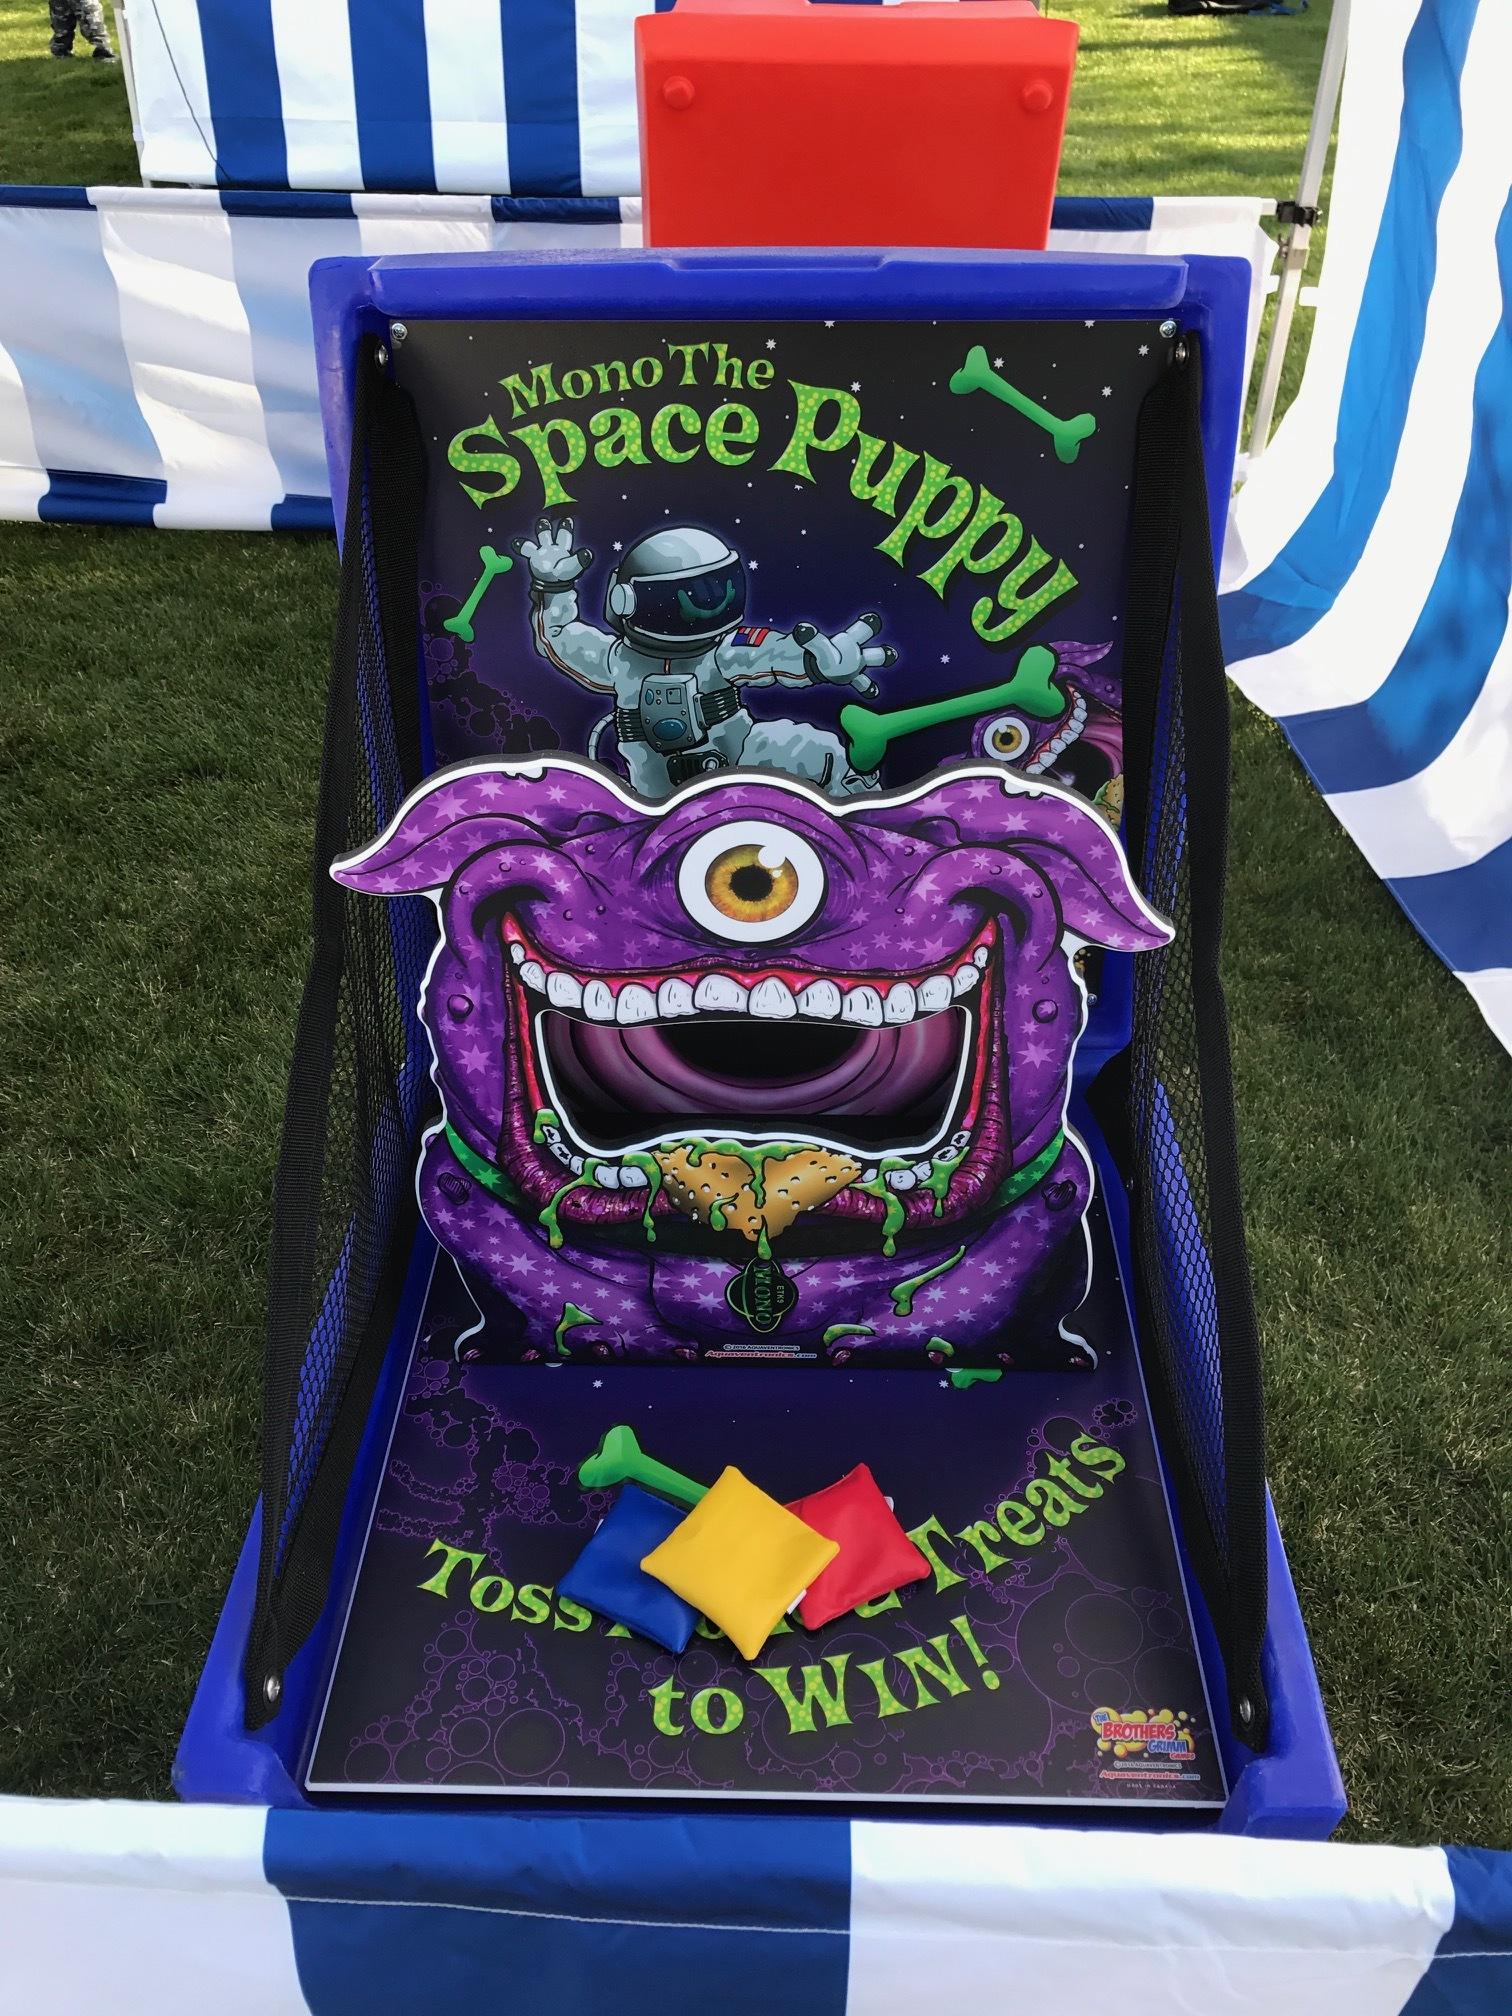 Space Puppy!